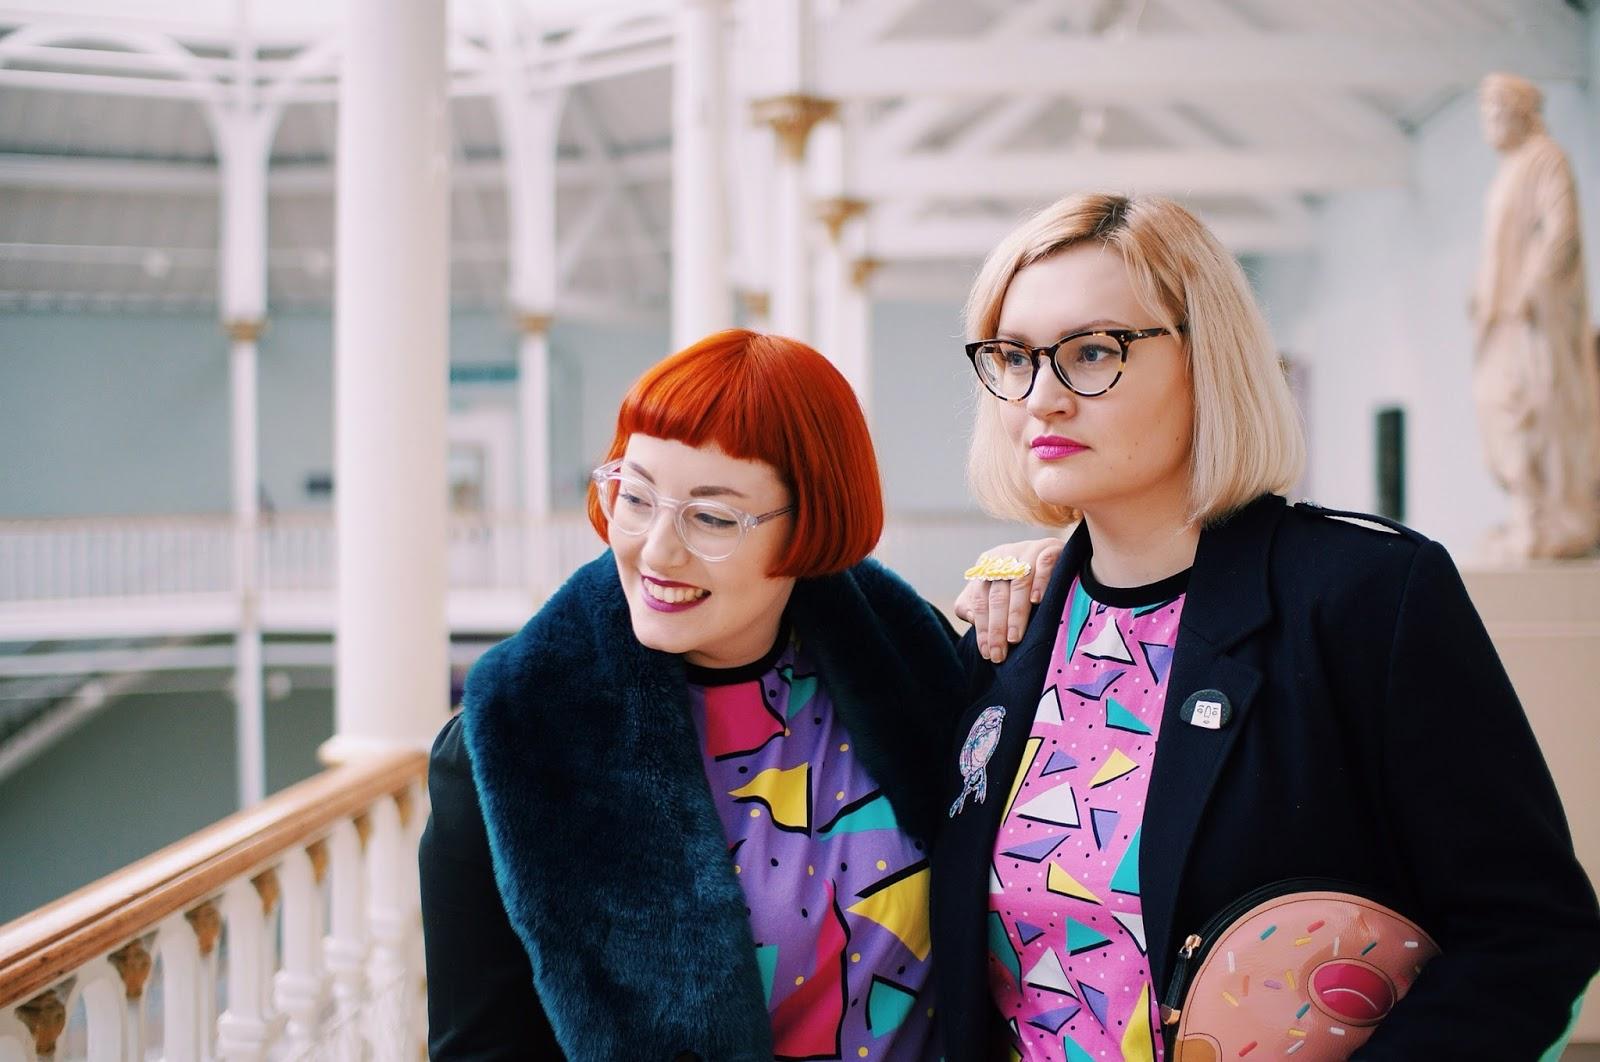 Helen and Kimberley, Wardrobe Conversations, Boya Shen, moveit video project, YouTube, National Museum of Scotland, photoshoot, Scottish bloggers,